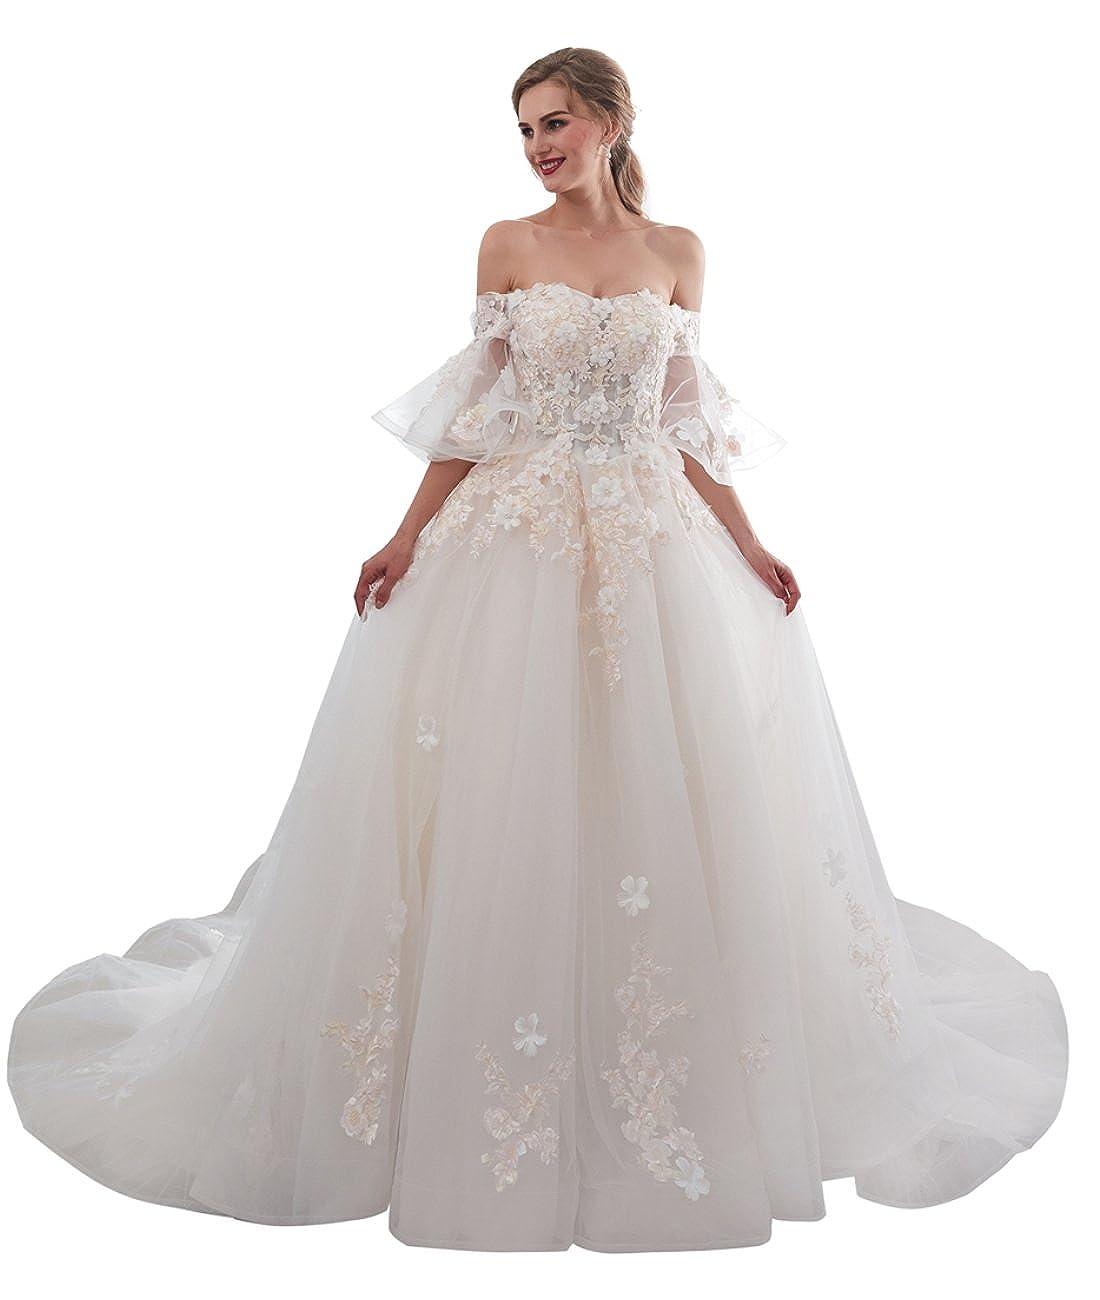 Champagne APXPF Women's Lace Flowers Ball Gown Wedding Dress for Bride Off Shoulder Bride Dress Chapel Train